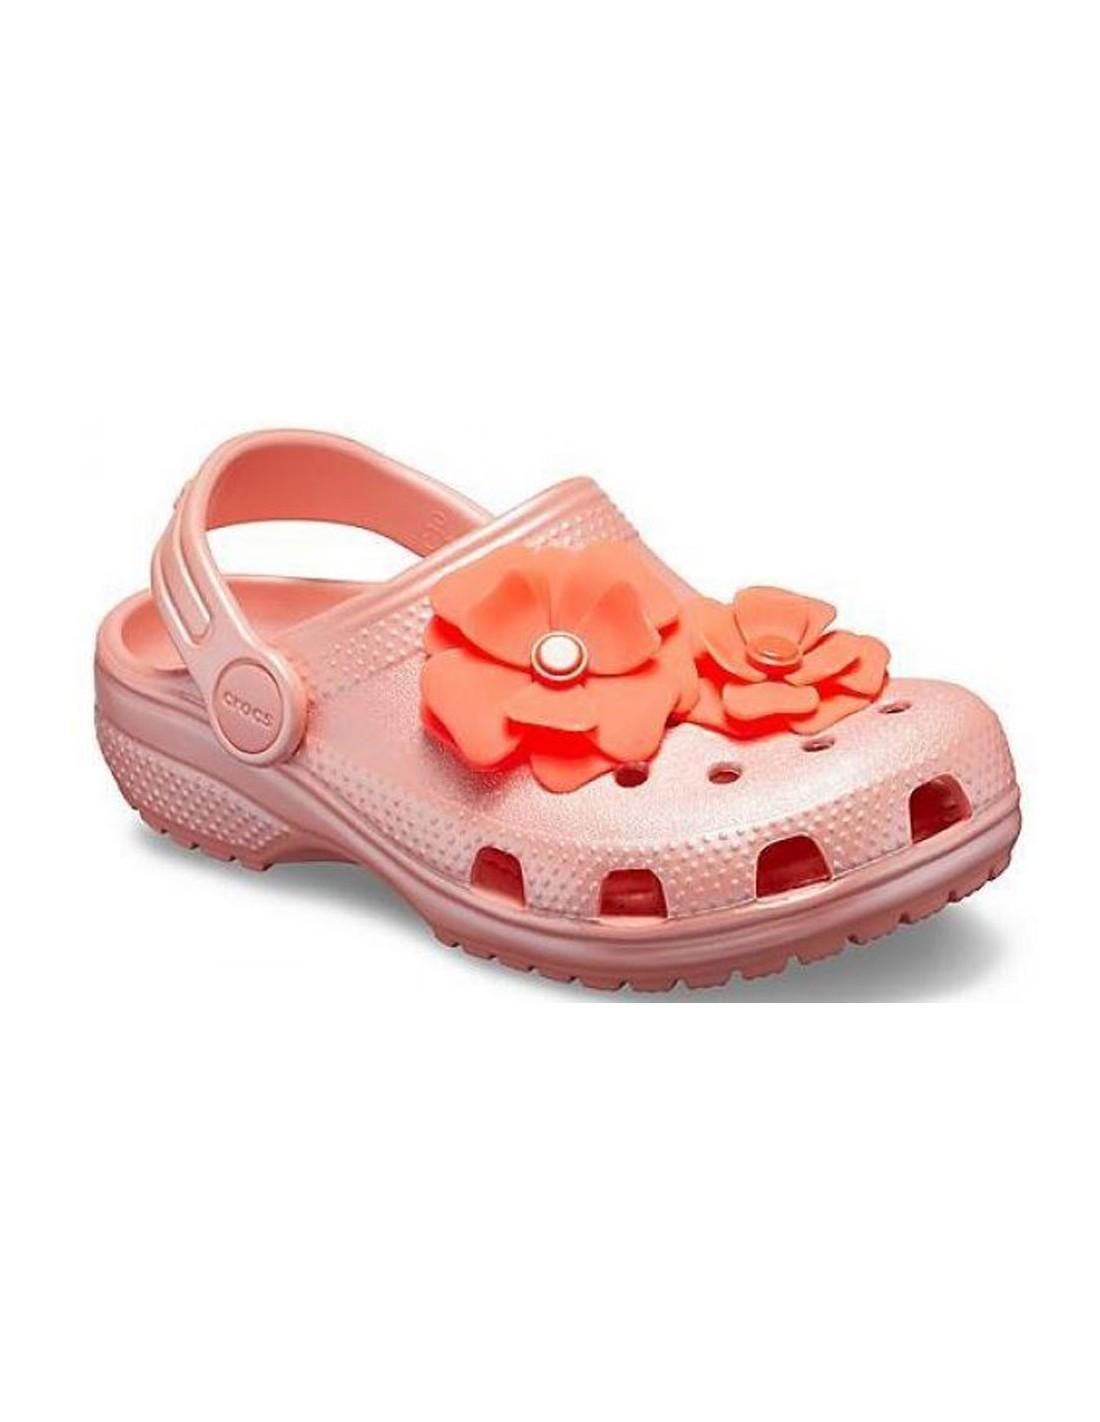 Clog Blooms Bambina Rosa Crocs Sandalo JTFl1c3K